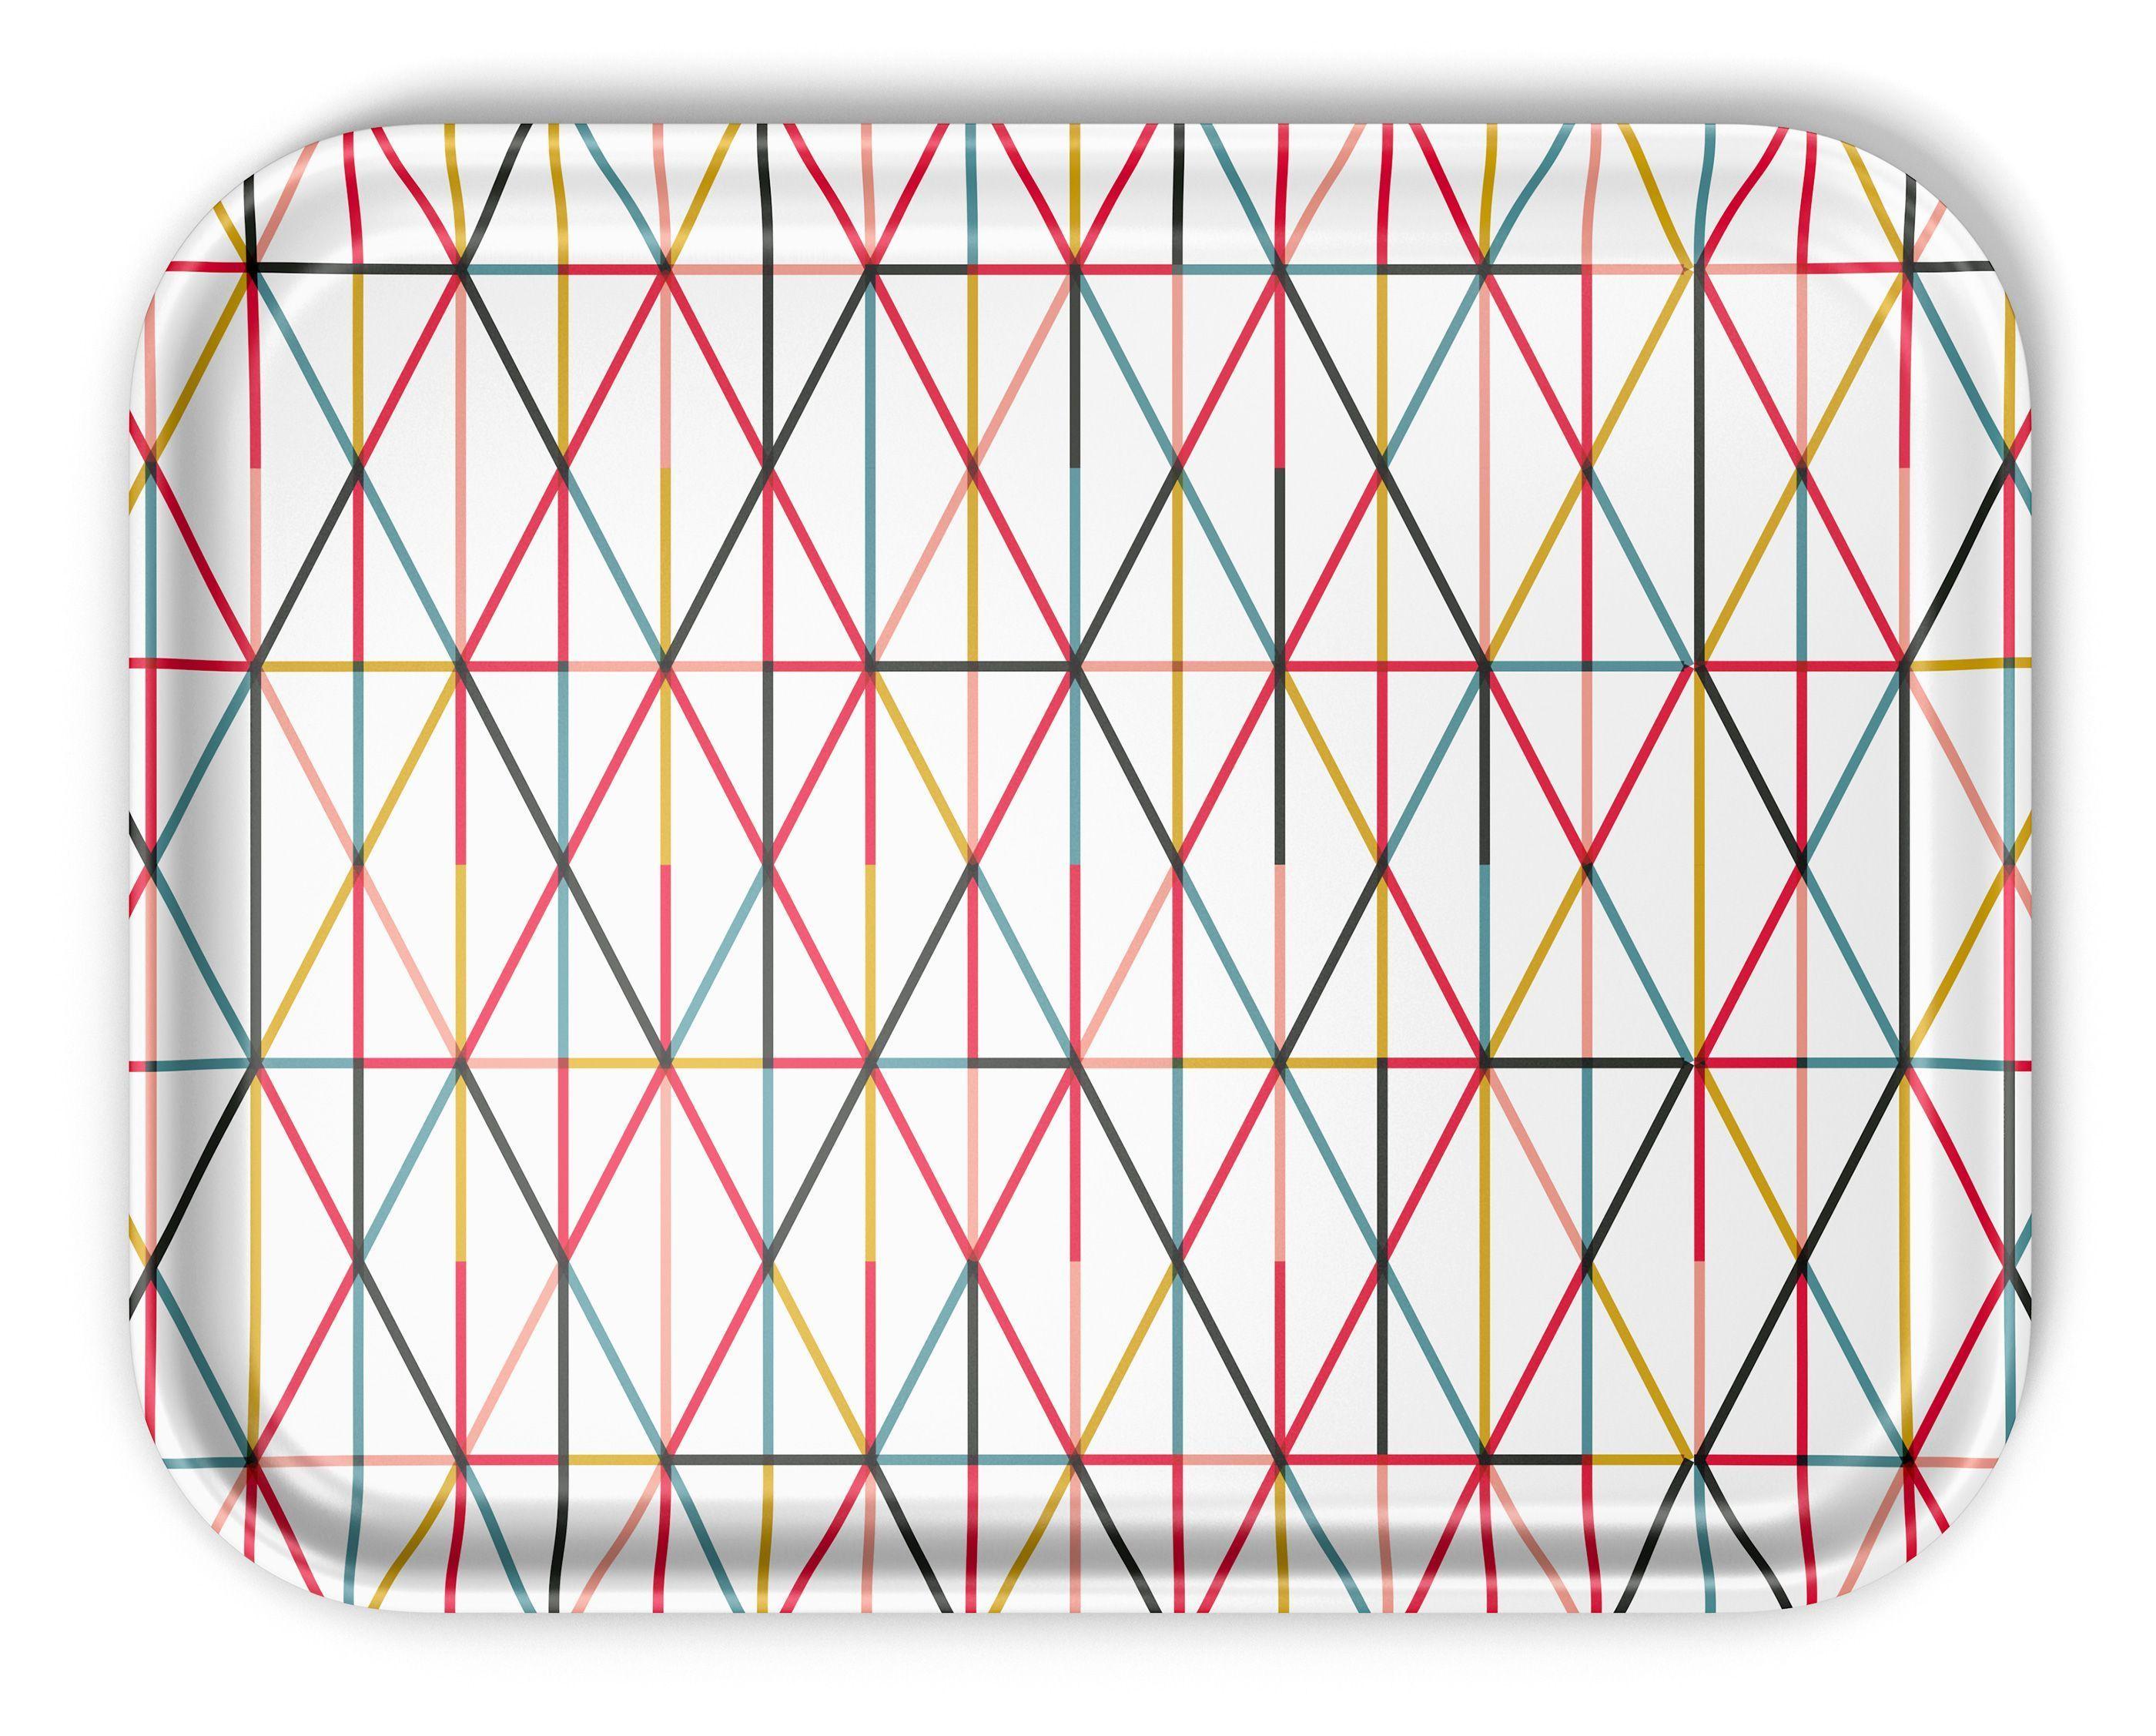 Vitra Classic Tray Grid dienblad large kopen